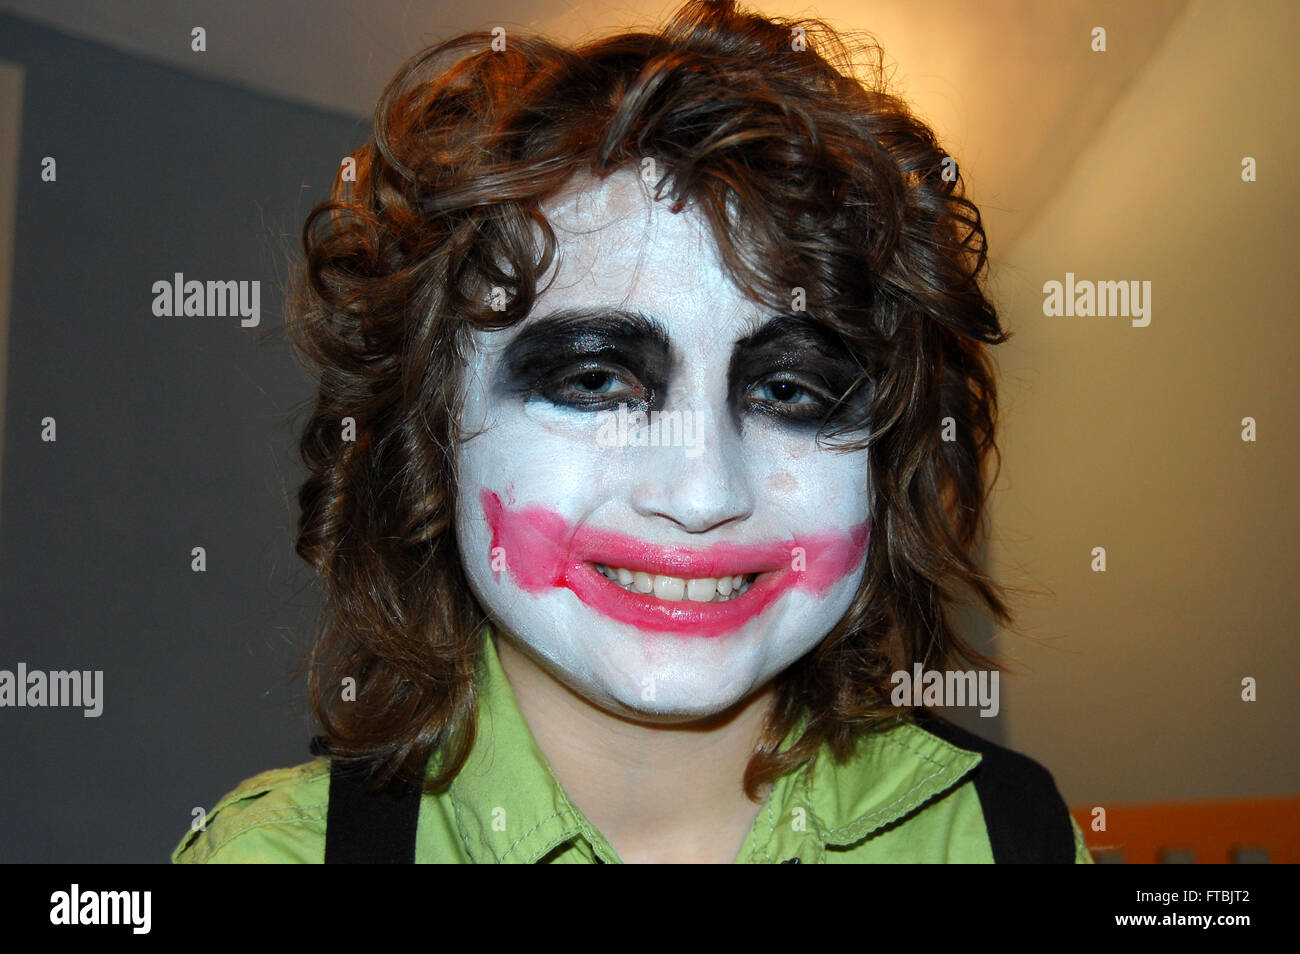 smiling boy in full halloween joker makeup stock photo: 101059842